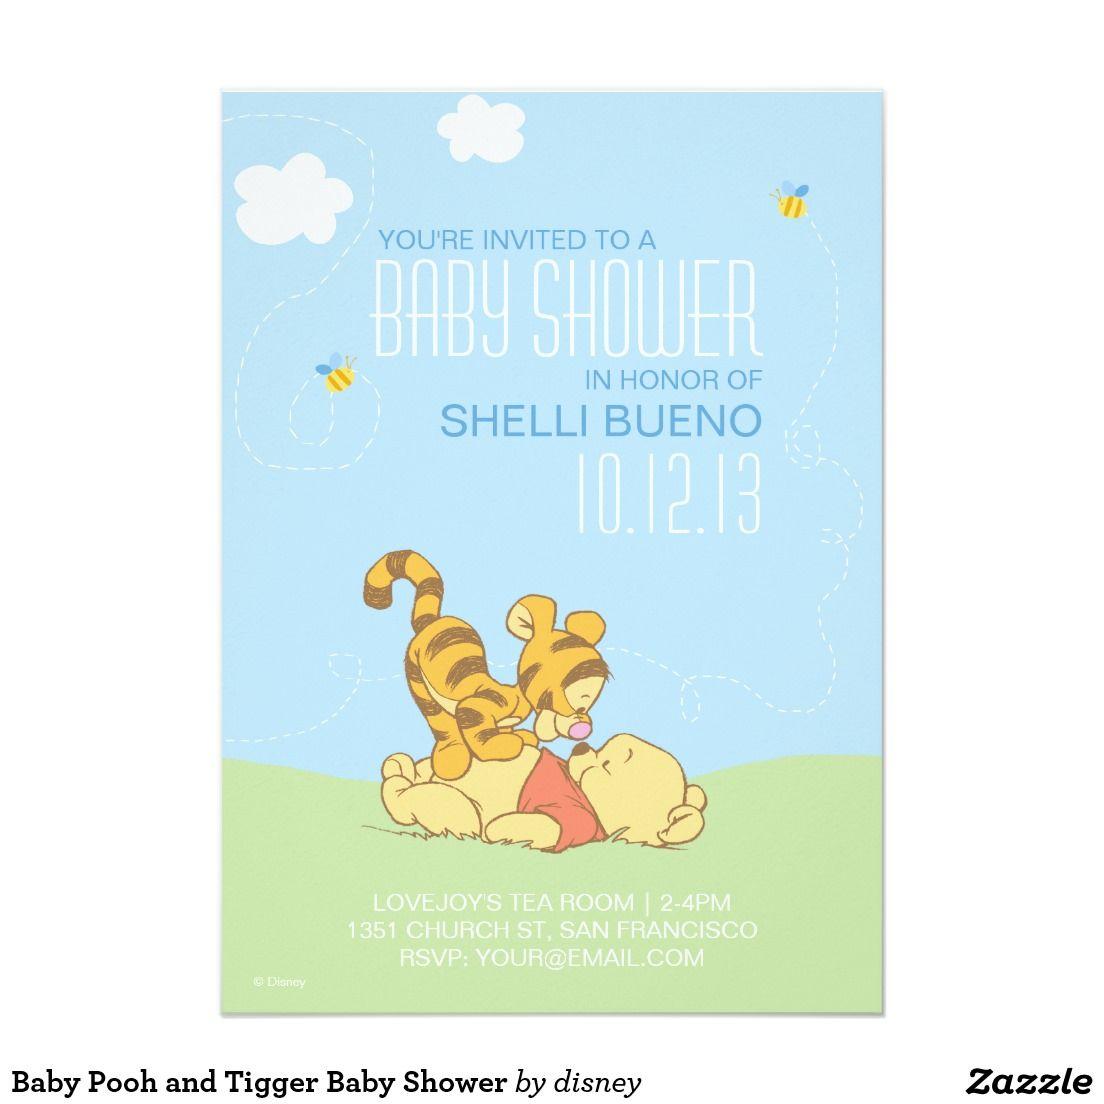 Baby Pooh and Tigger Baby Shower Invitation | Tigger, Shower ...